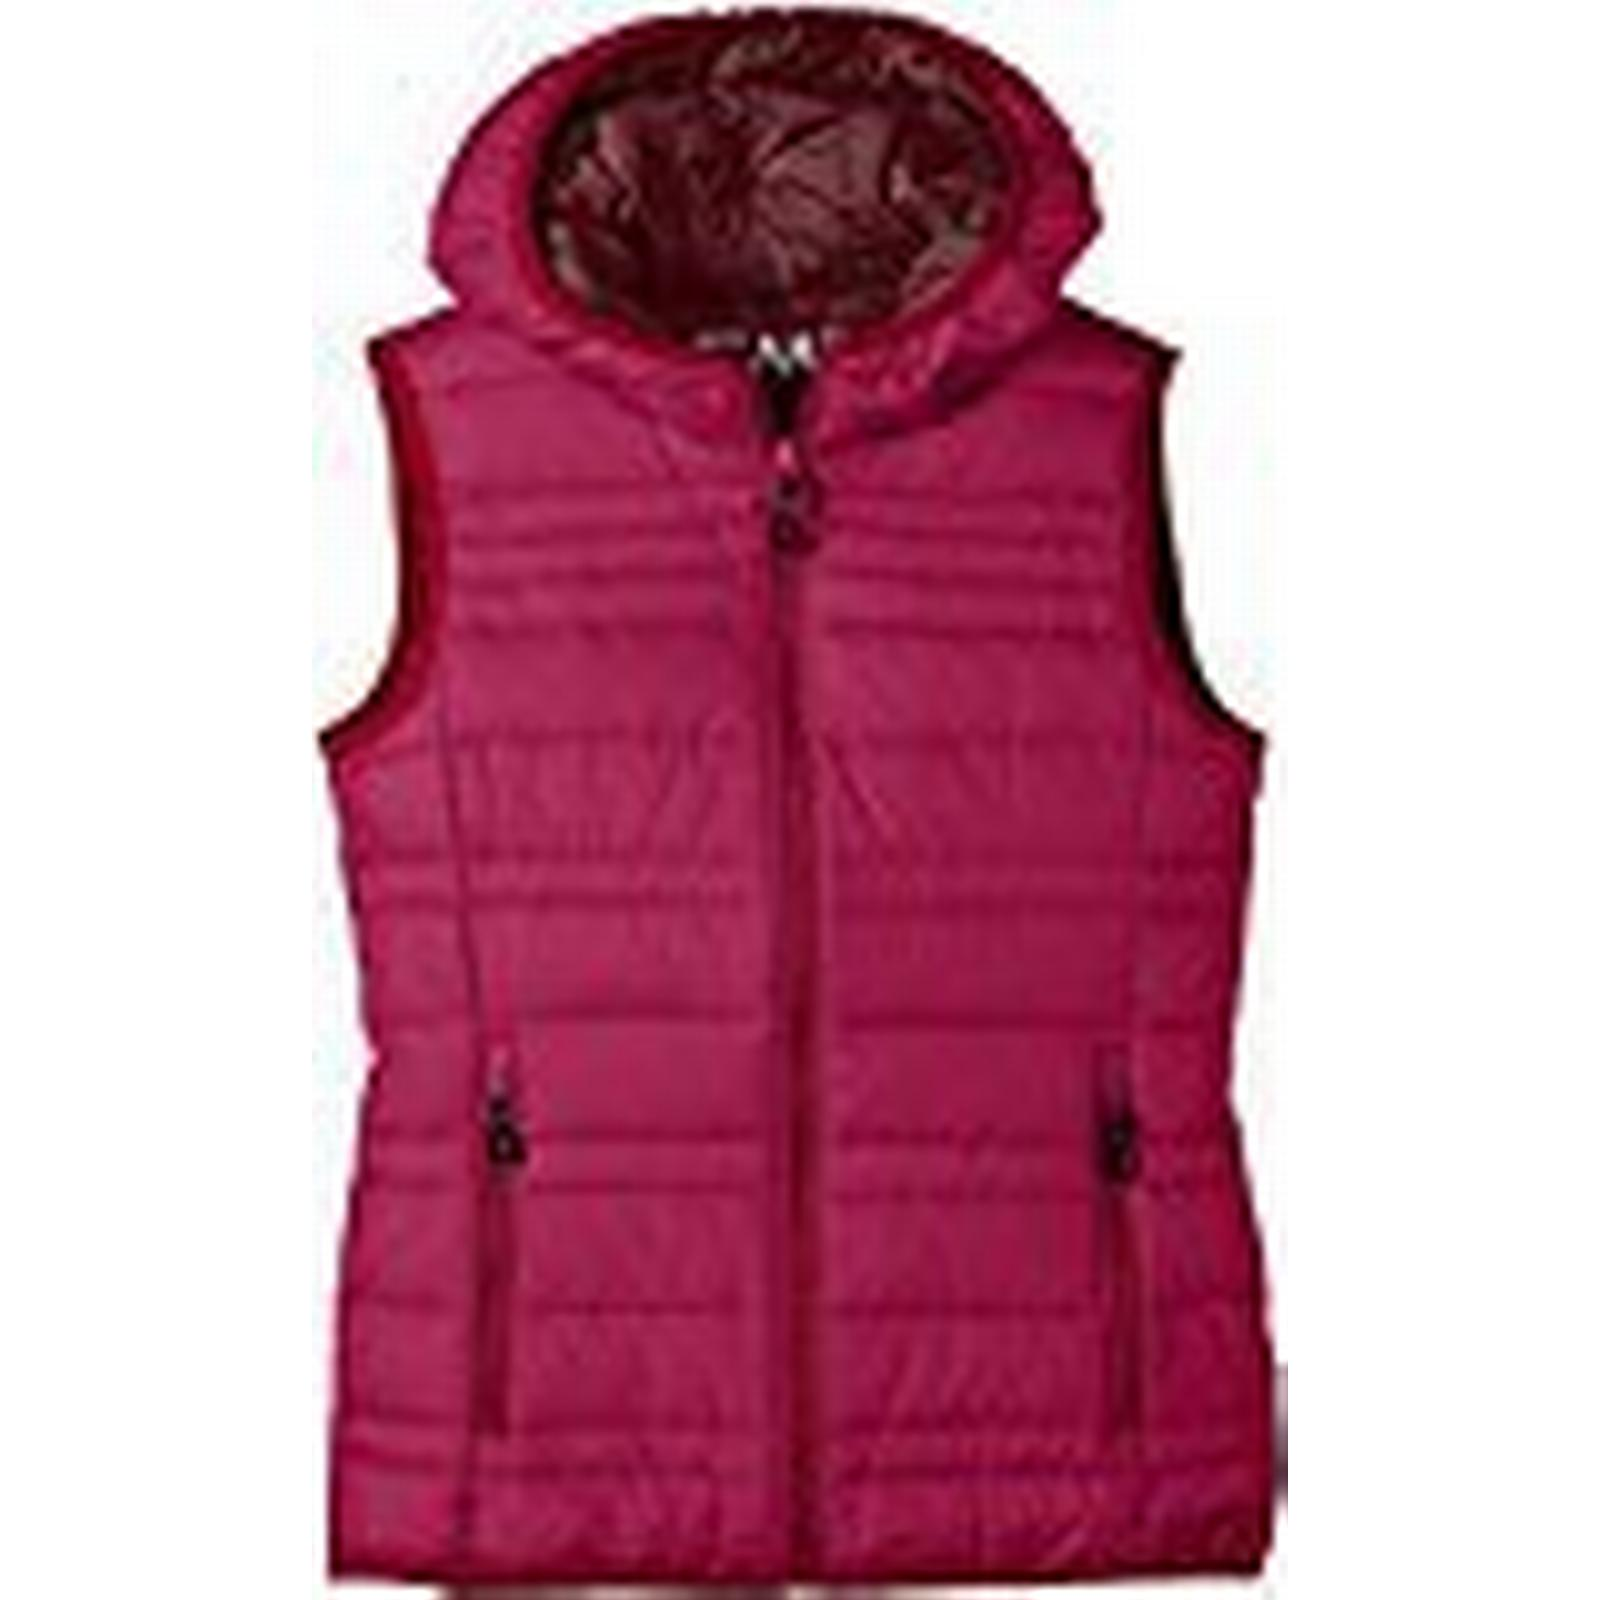 CMP Scarlet/Porto Girl's Down Vest Pink Scarlet/Porto CMP Melange Size:15 years adc0f9